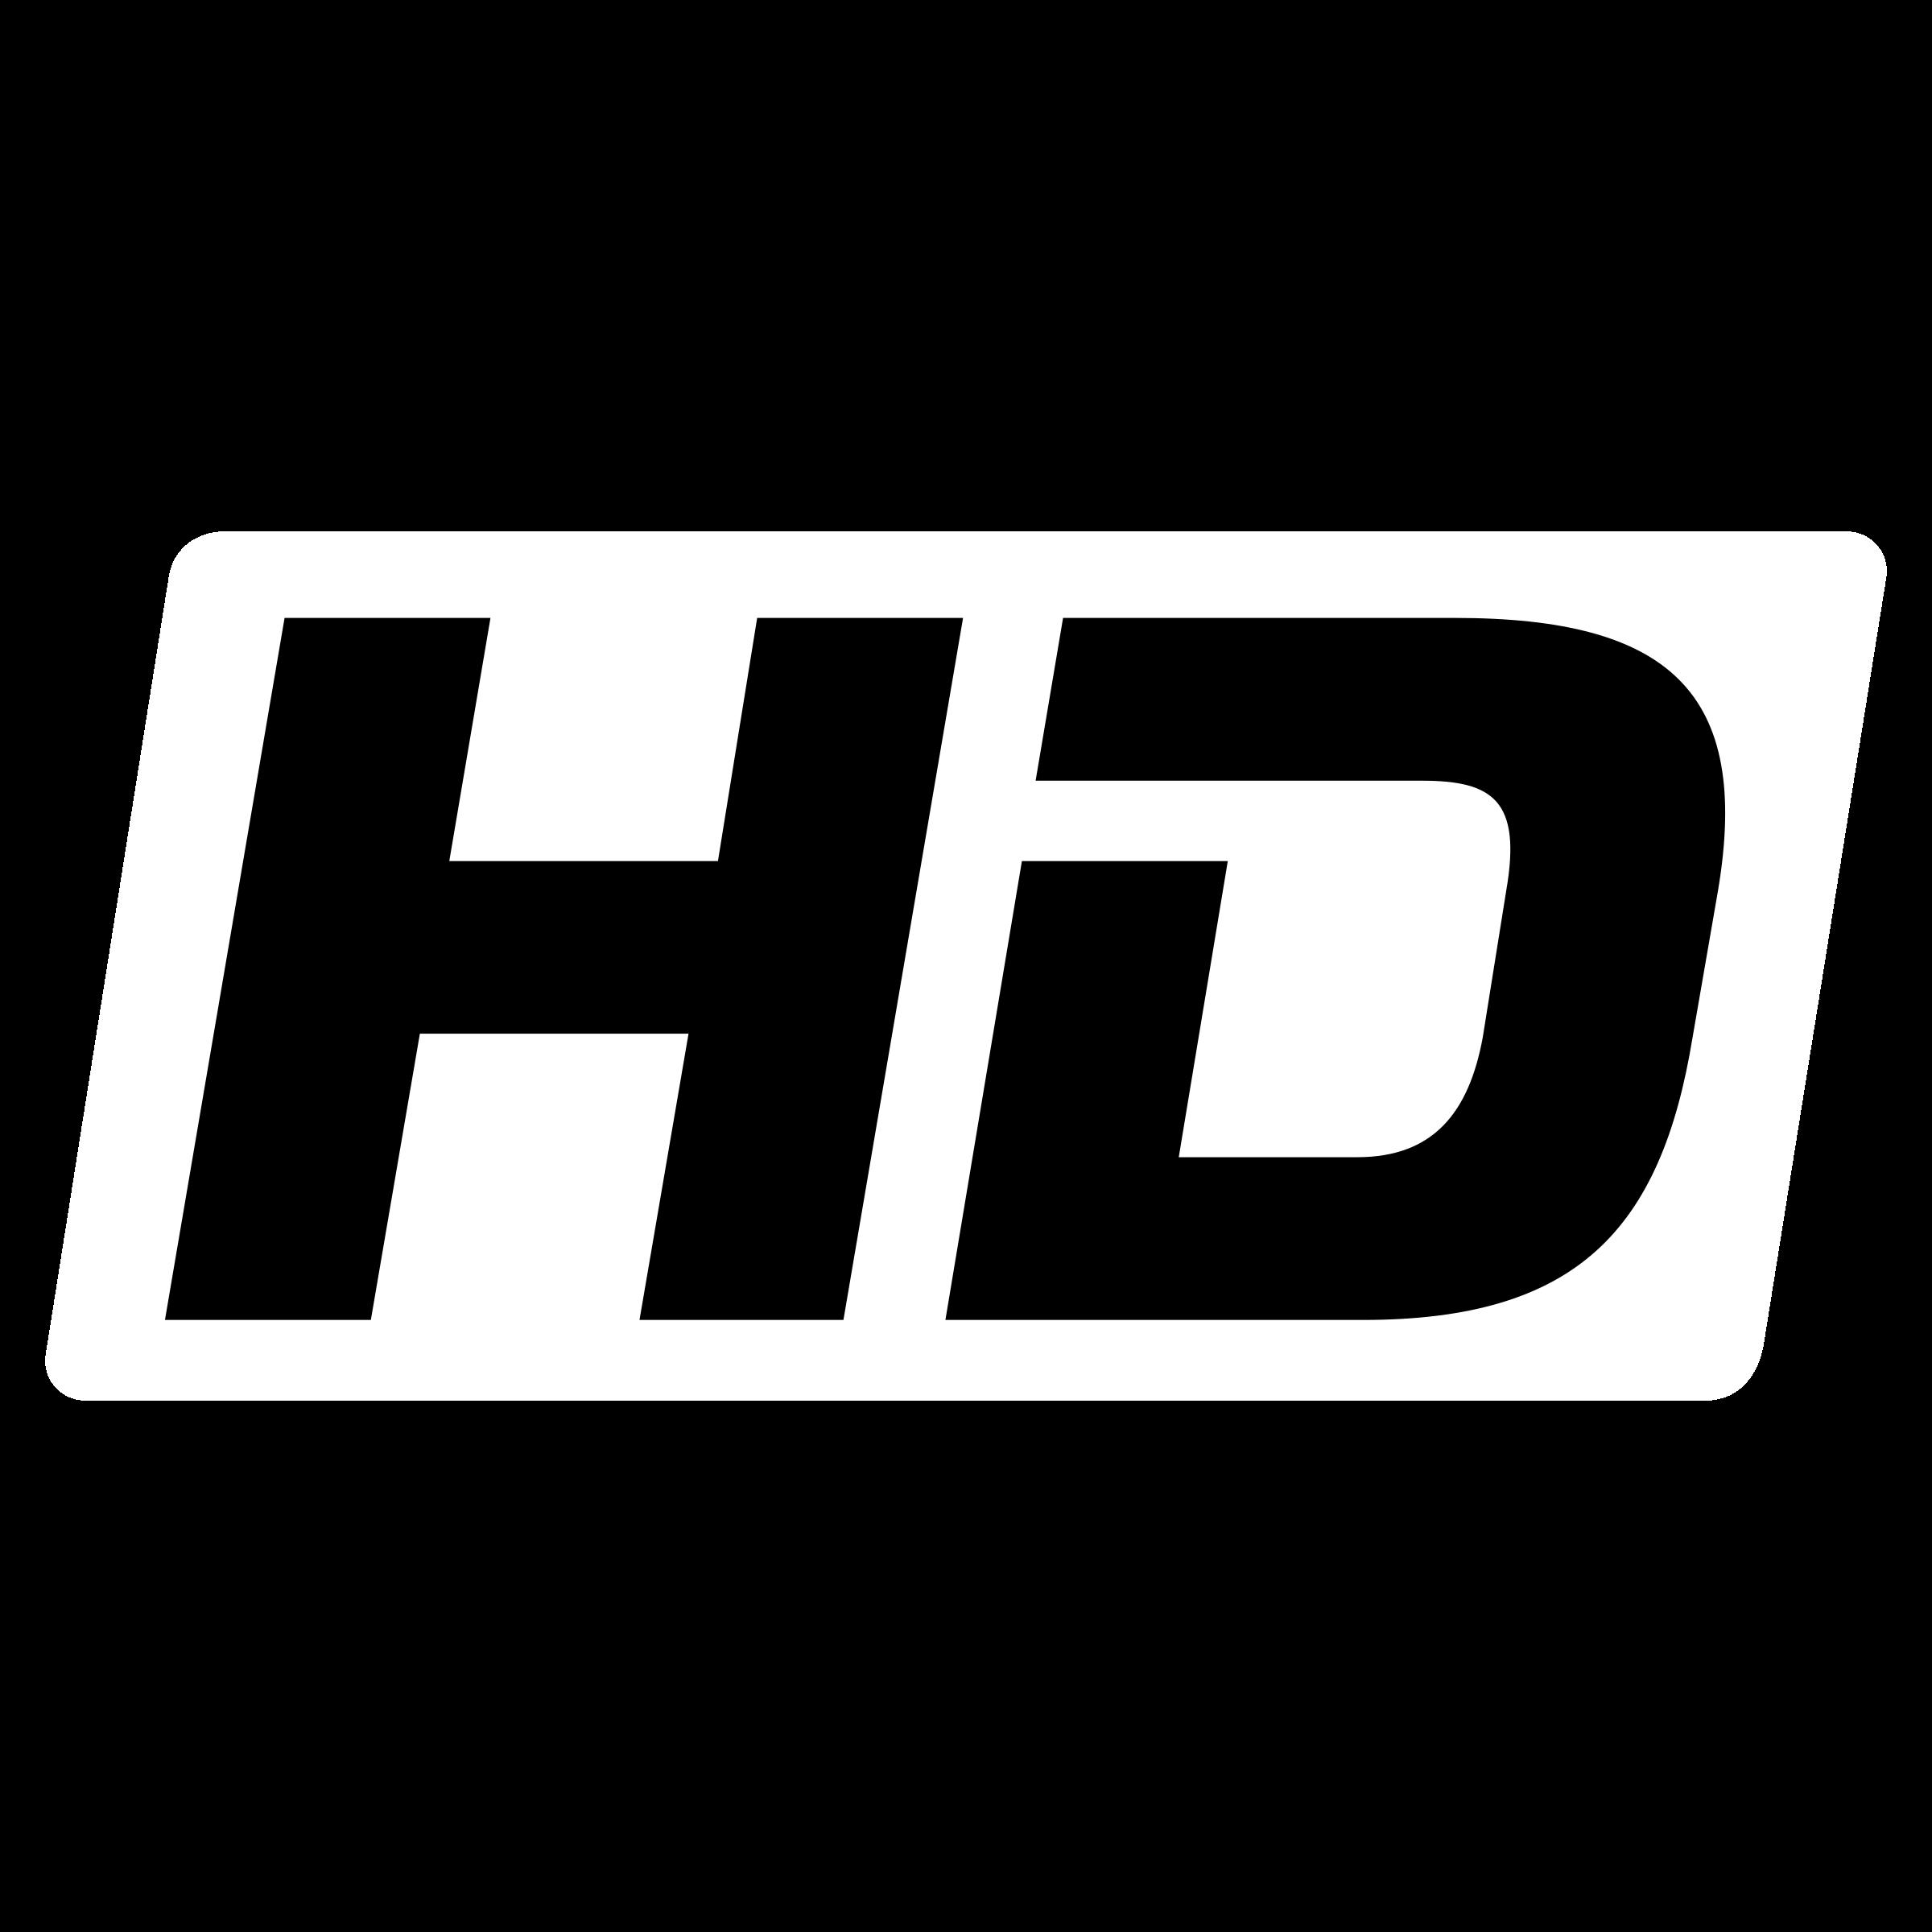 hd logo png transparent svg vector freebie supply rh freebiesupply com hd logistics llc hd logos of pakistani institutions